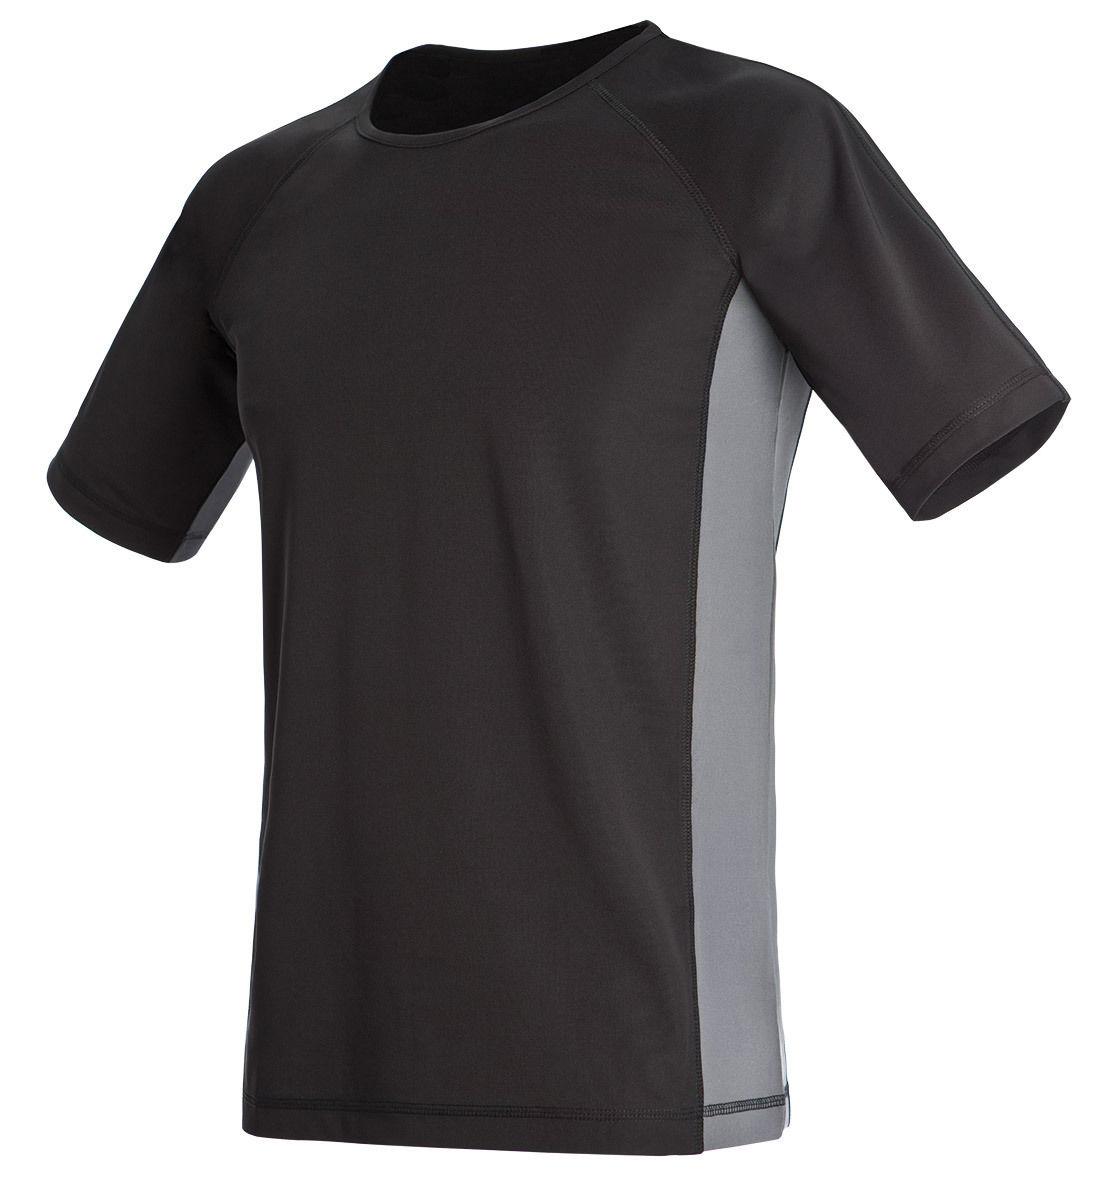 Hanes Mens Cool Dri Short Sleeve Performance T Shirt Polyester Tee S-3XL 4820